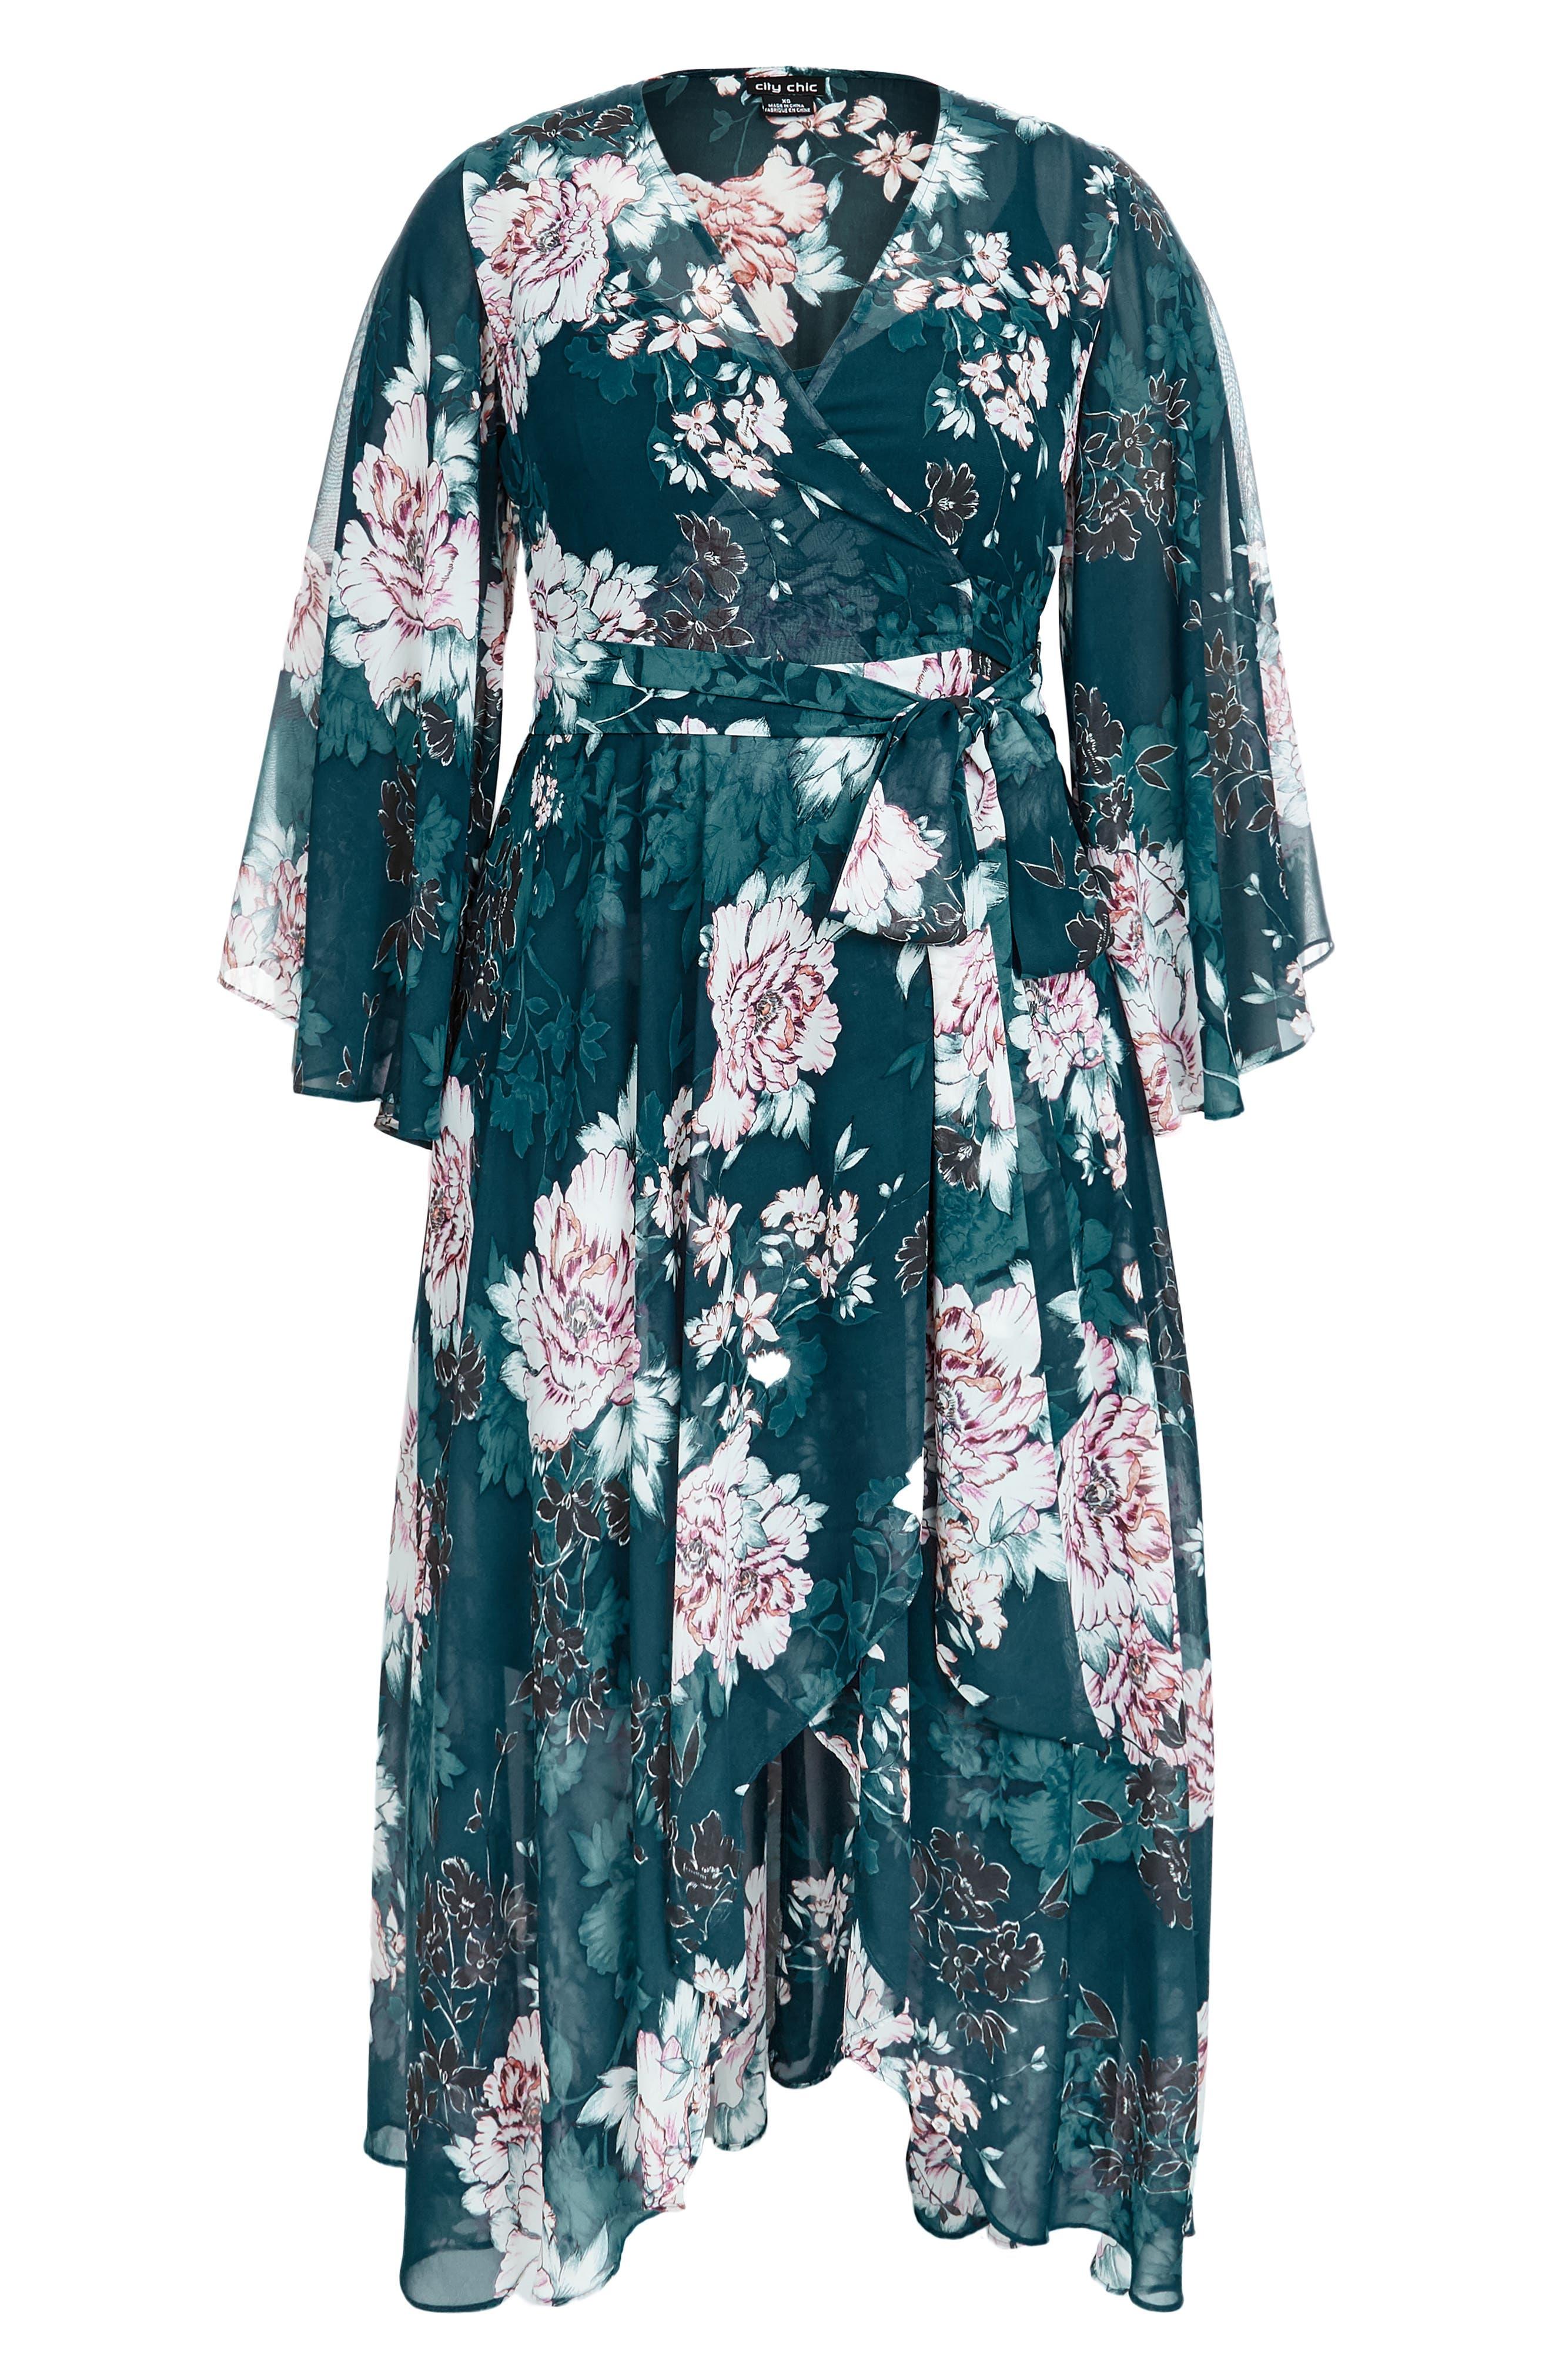 CITY CHIC,                             Jade Blossom Wrap Maxi Dress,                             Alternate thumbnail 3, color,                             JADE BLOSSOM